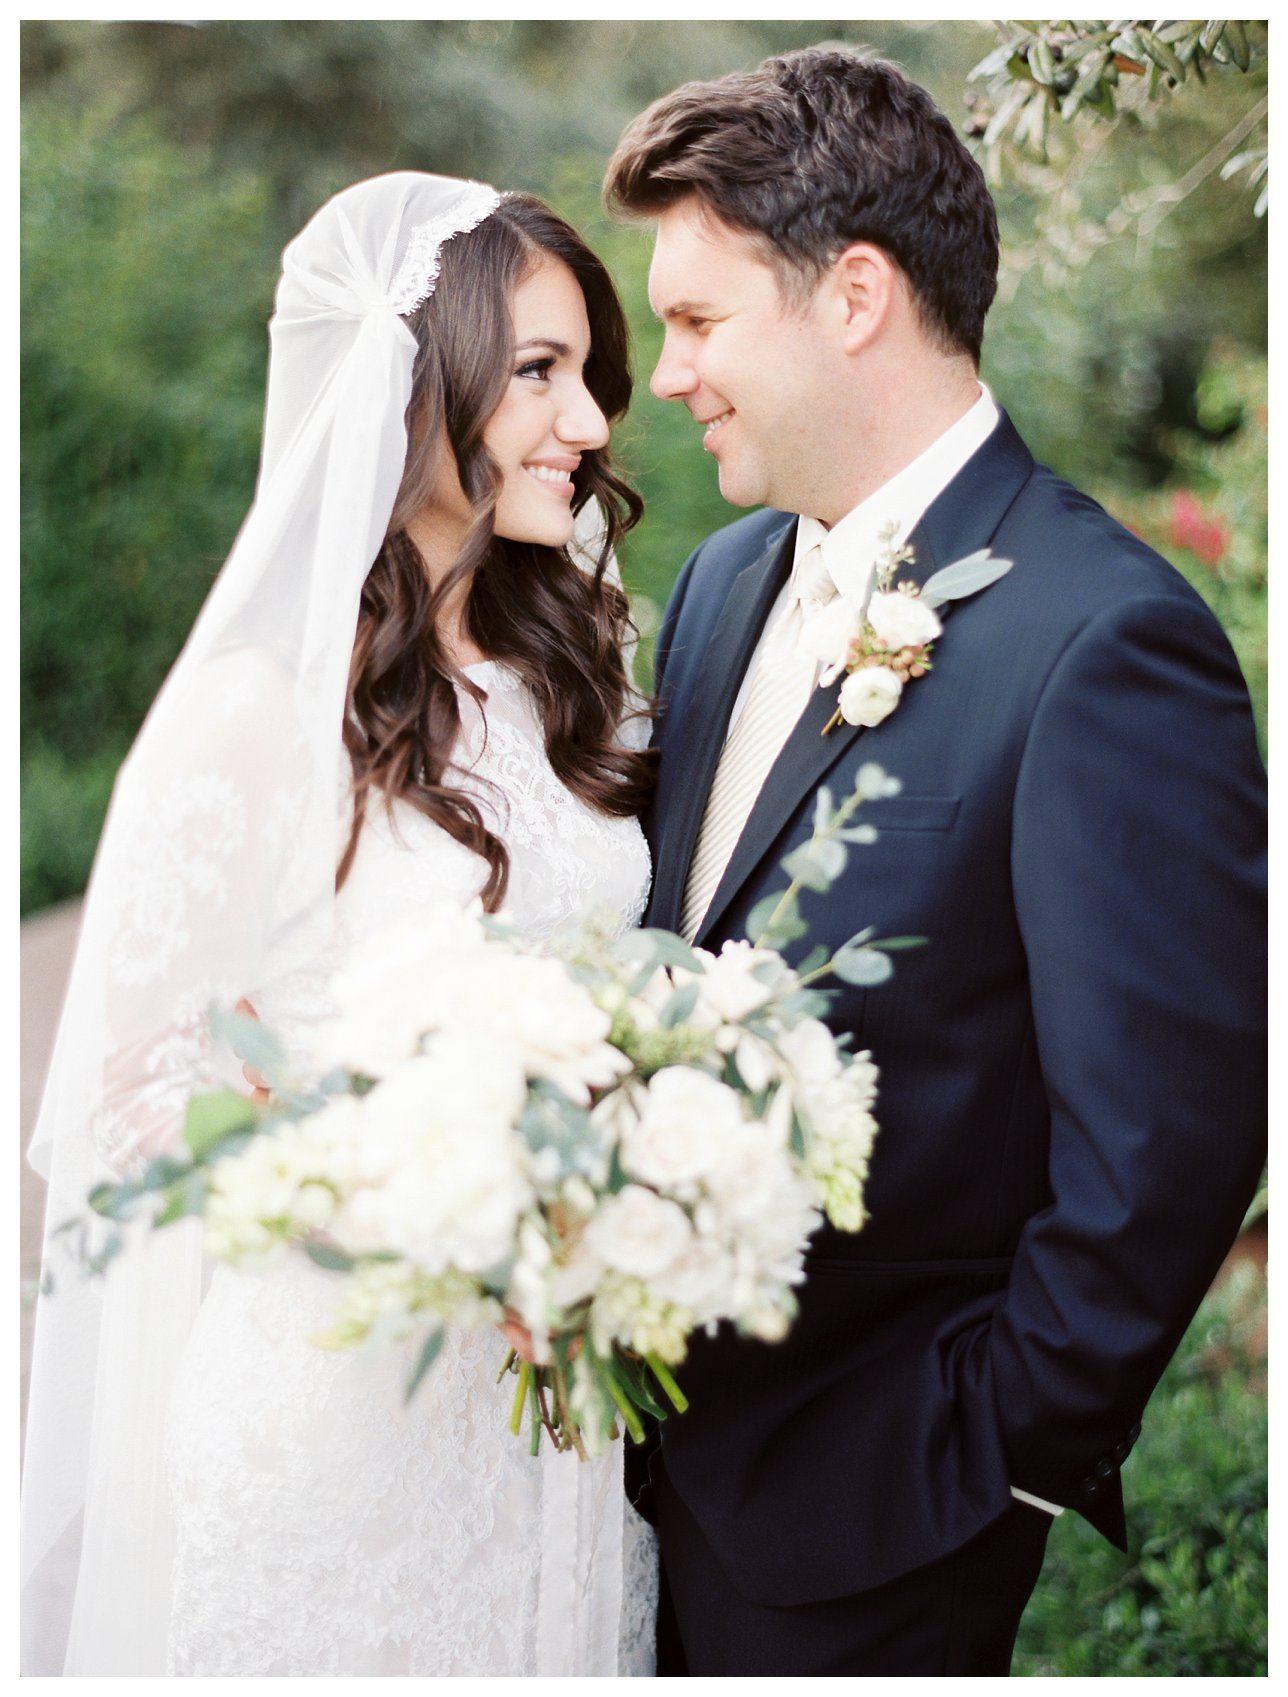 Juliet veil lace wedding gown navy tux eucalyptus rachel